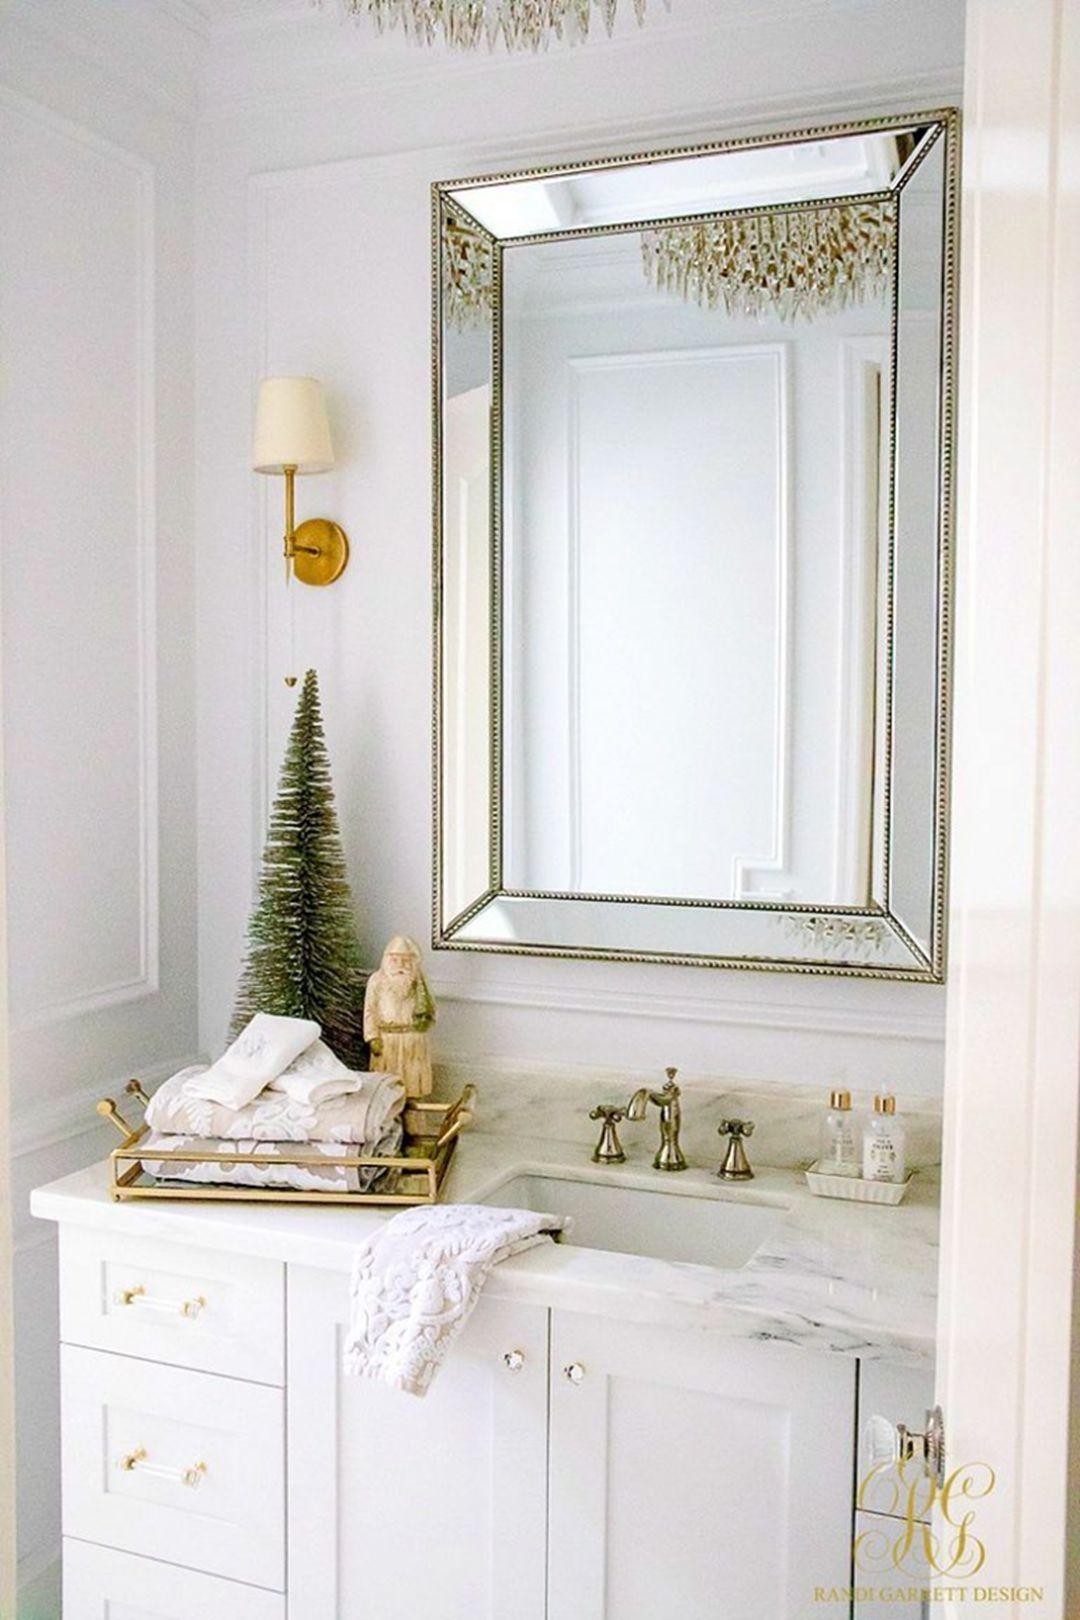 50 Amazing Christmas Bathroom Decorations That Will Amaze ...